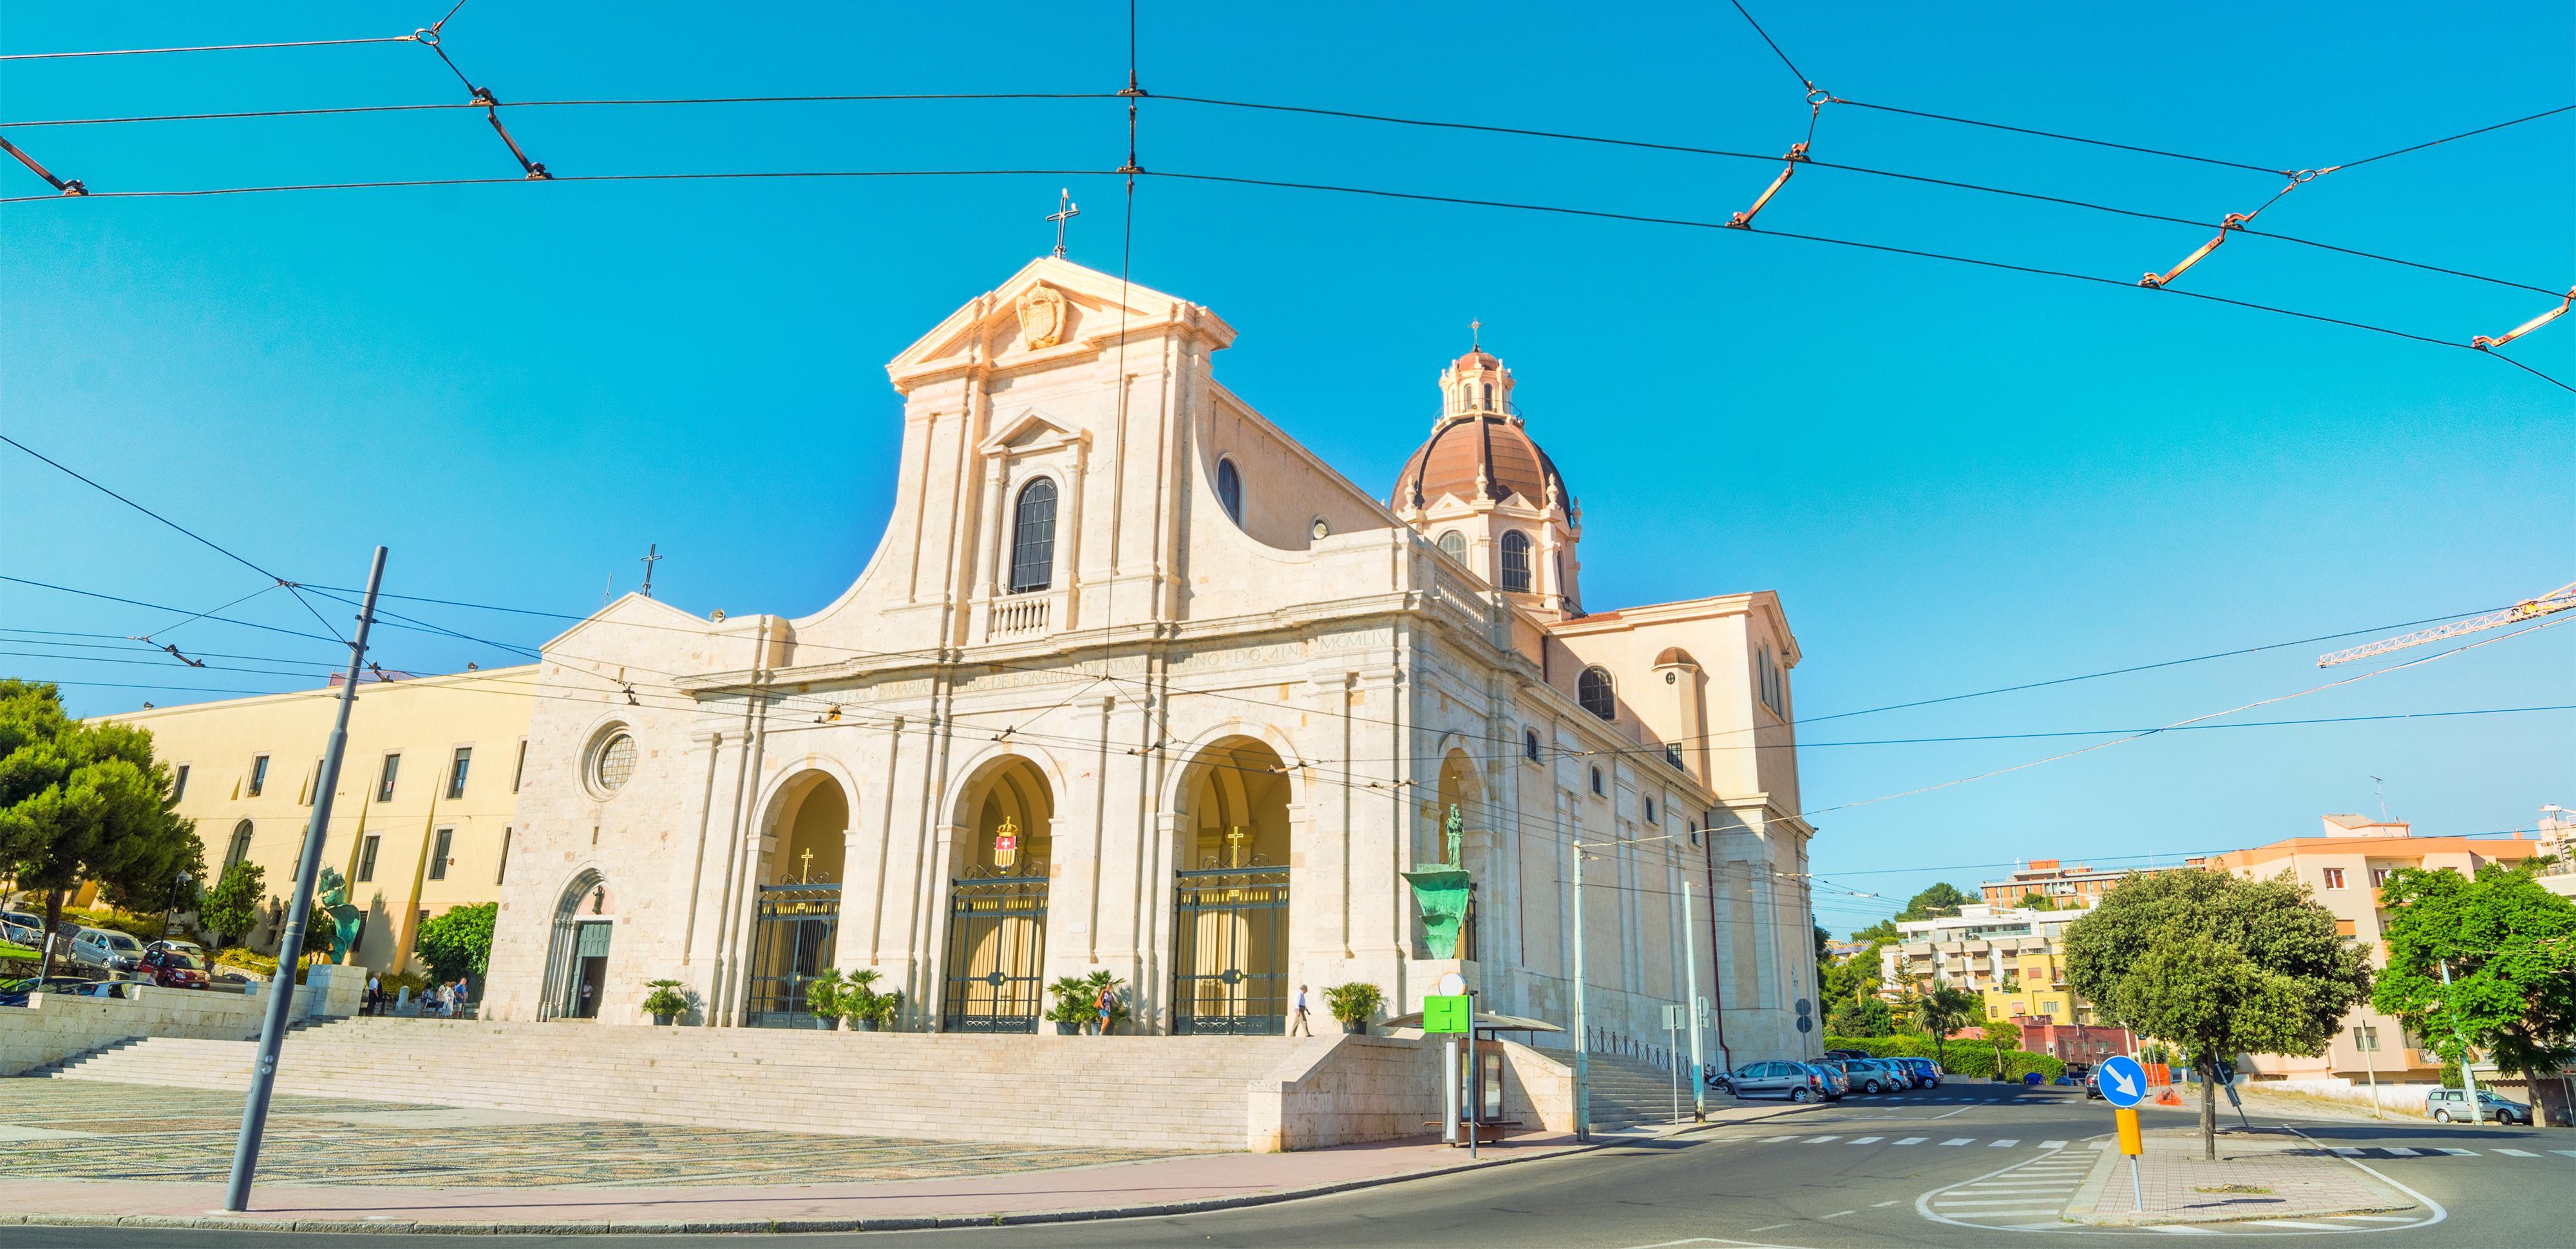 Santuario e Basilica di Nostra Signora di Bonaria